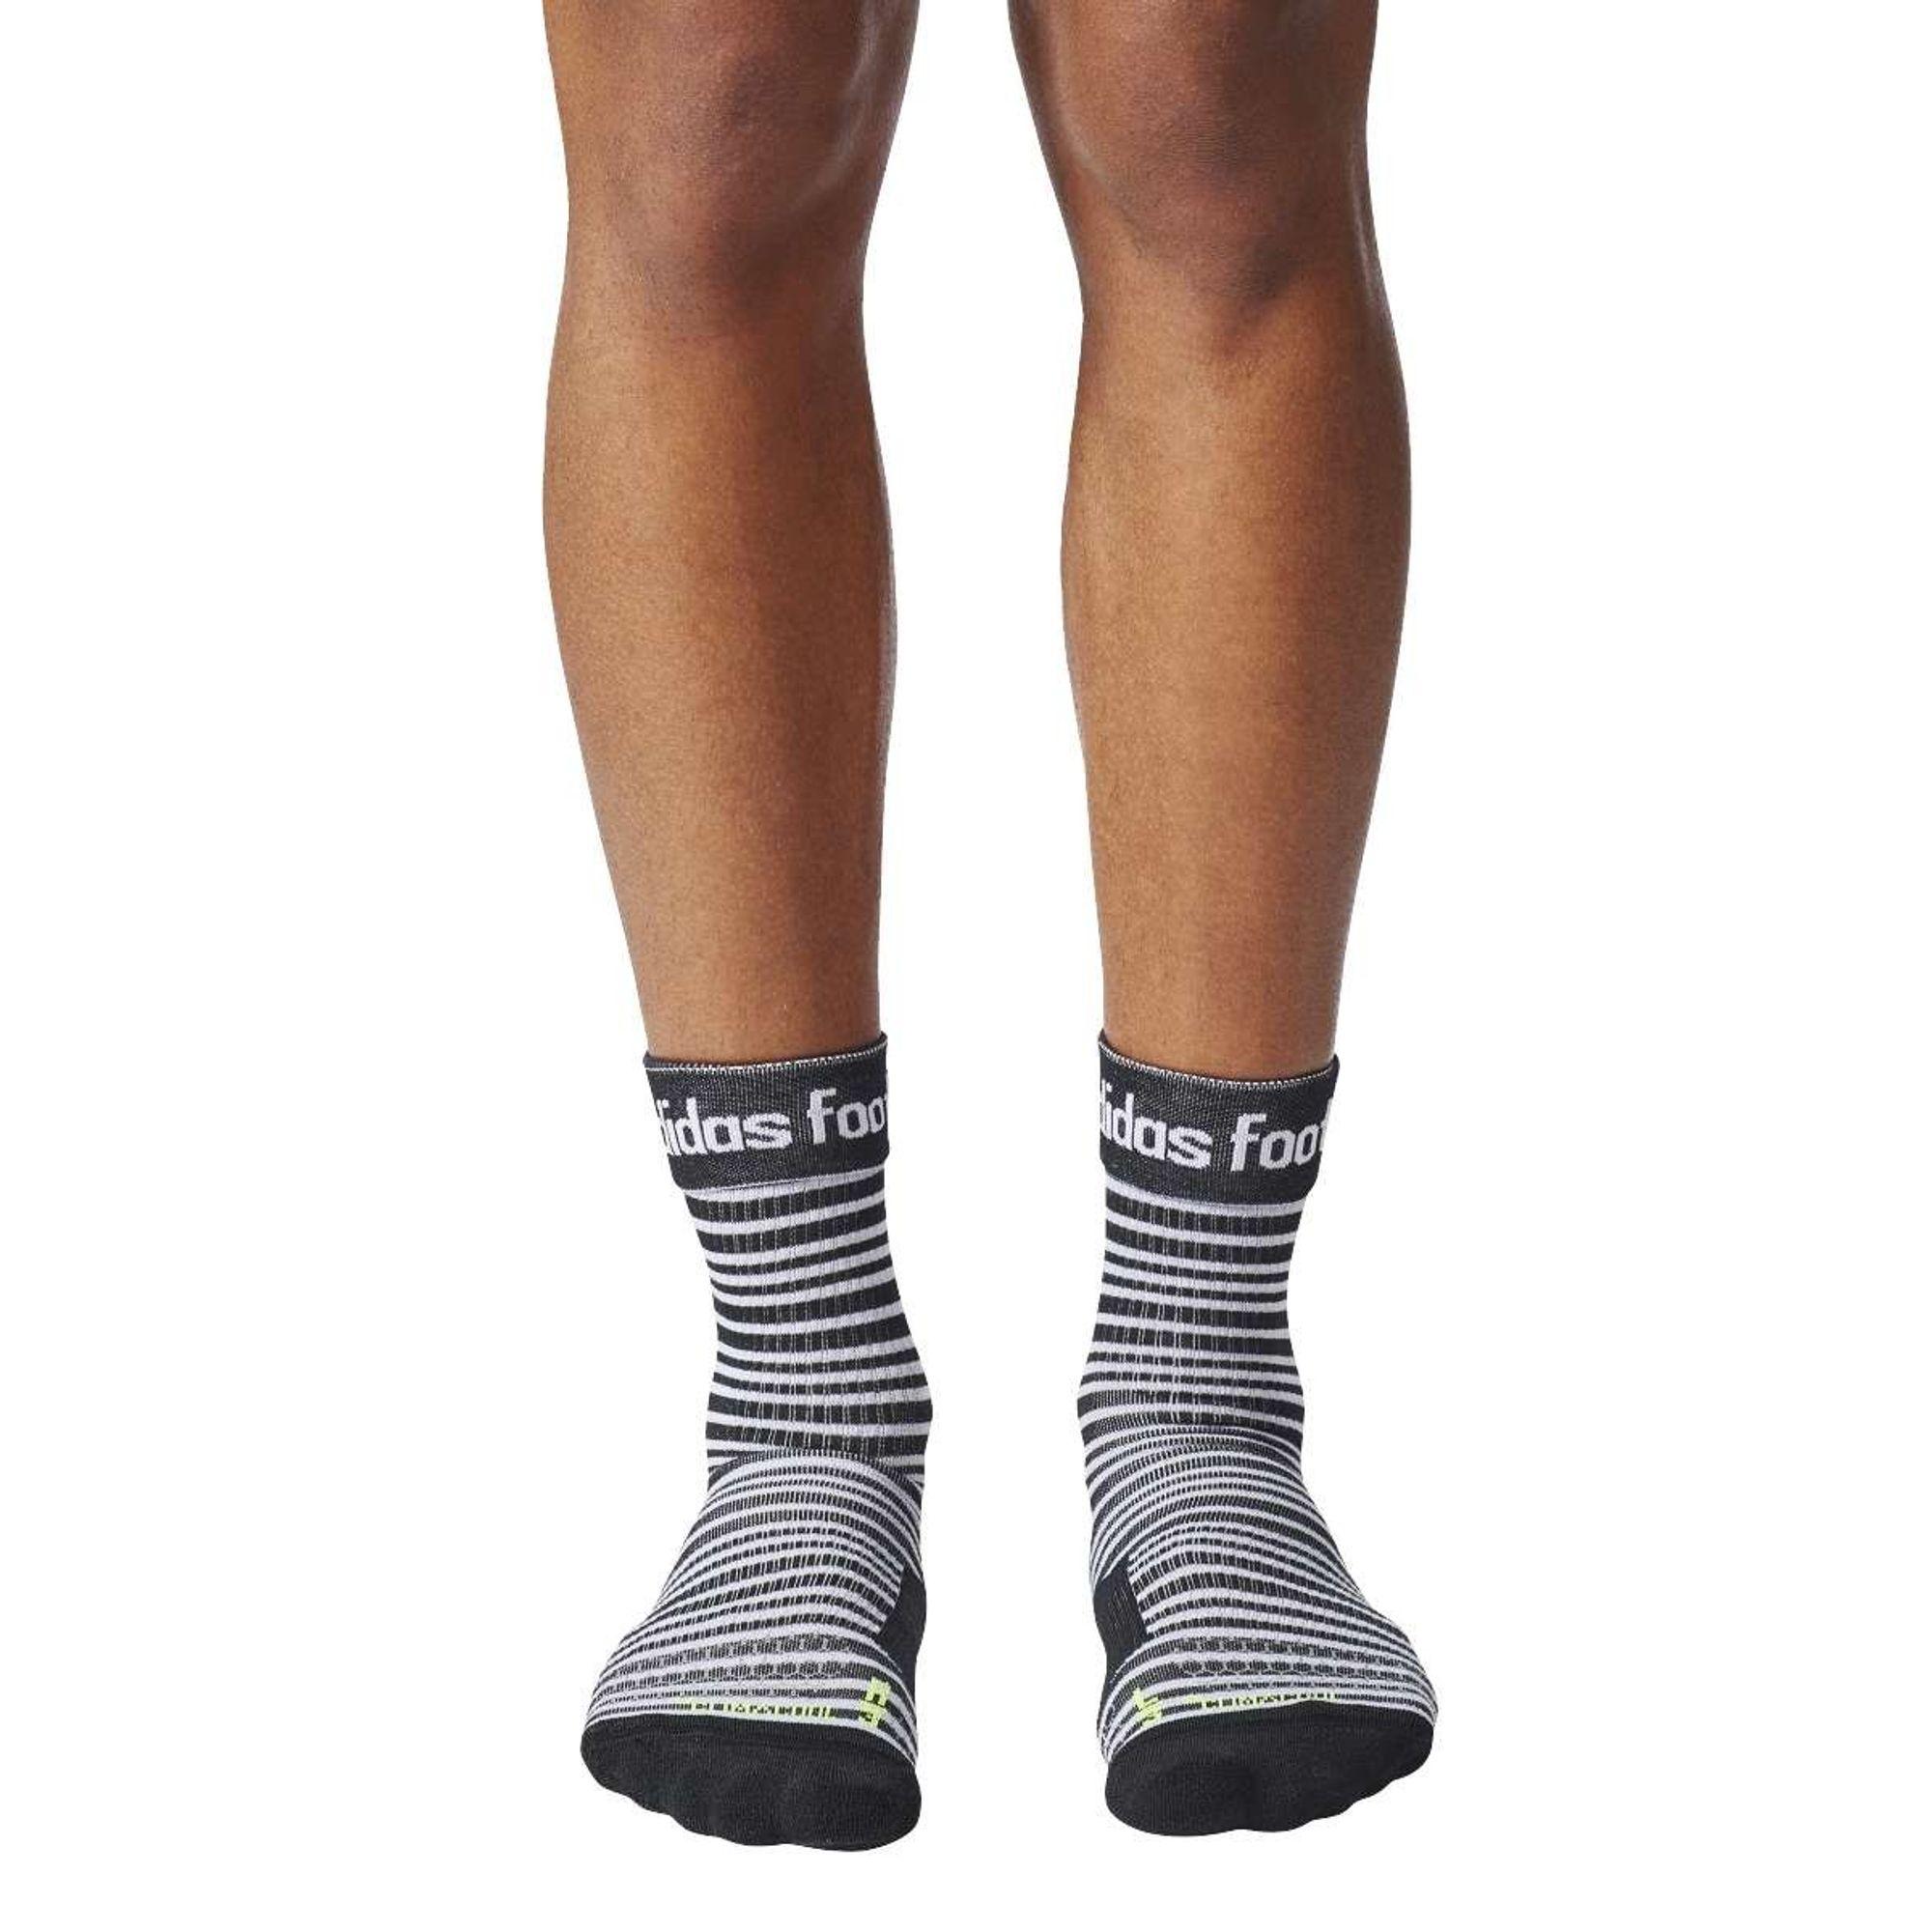 adidas Fi Socks - white/black/syello